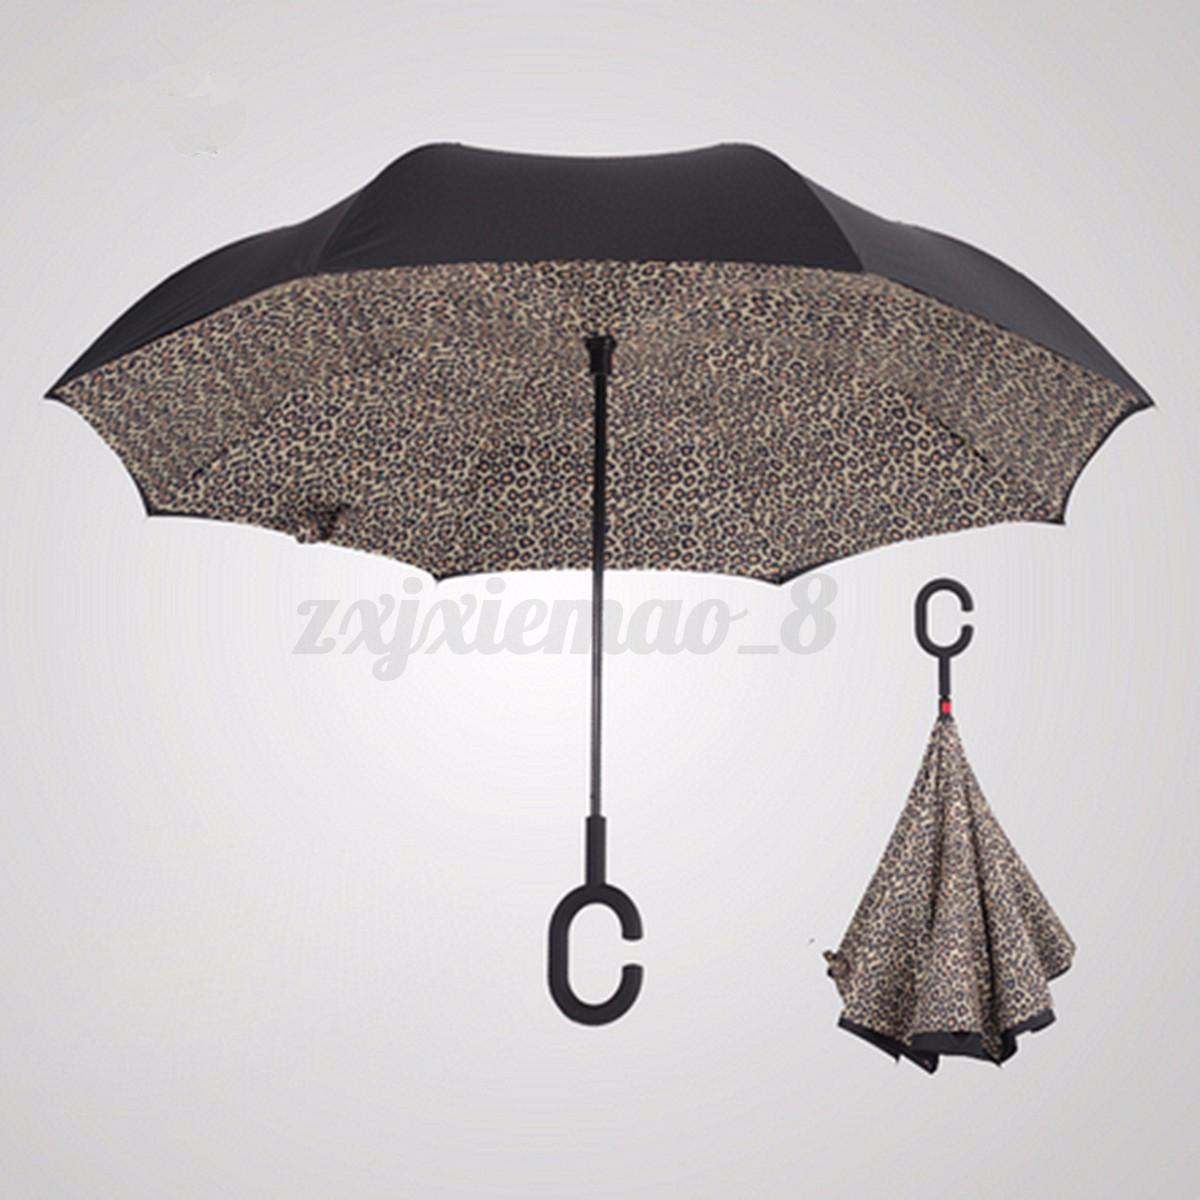 Windproof Upside Down Double Layer Reverse Umbrella C